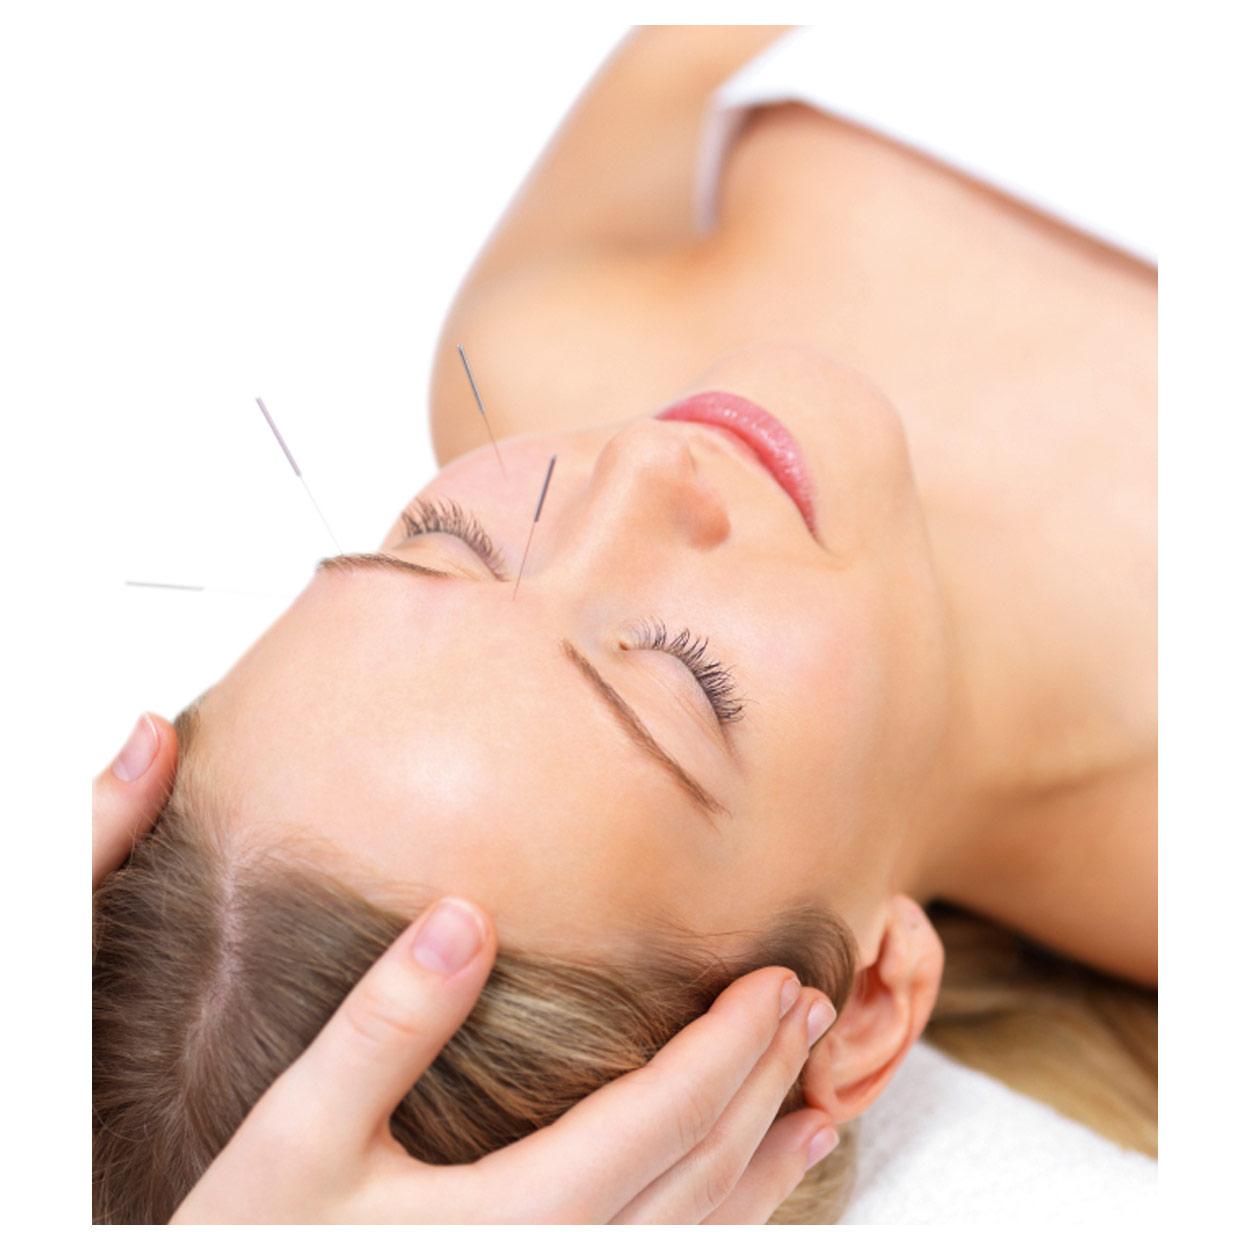 Indexbild 6 - Akupunkturnadeln mit Kunststoffgriff, Akupunktur